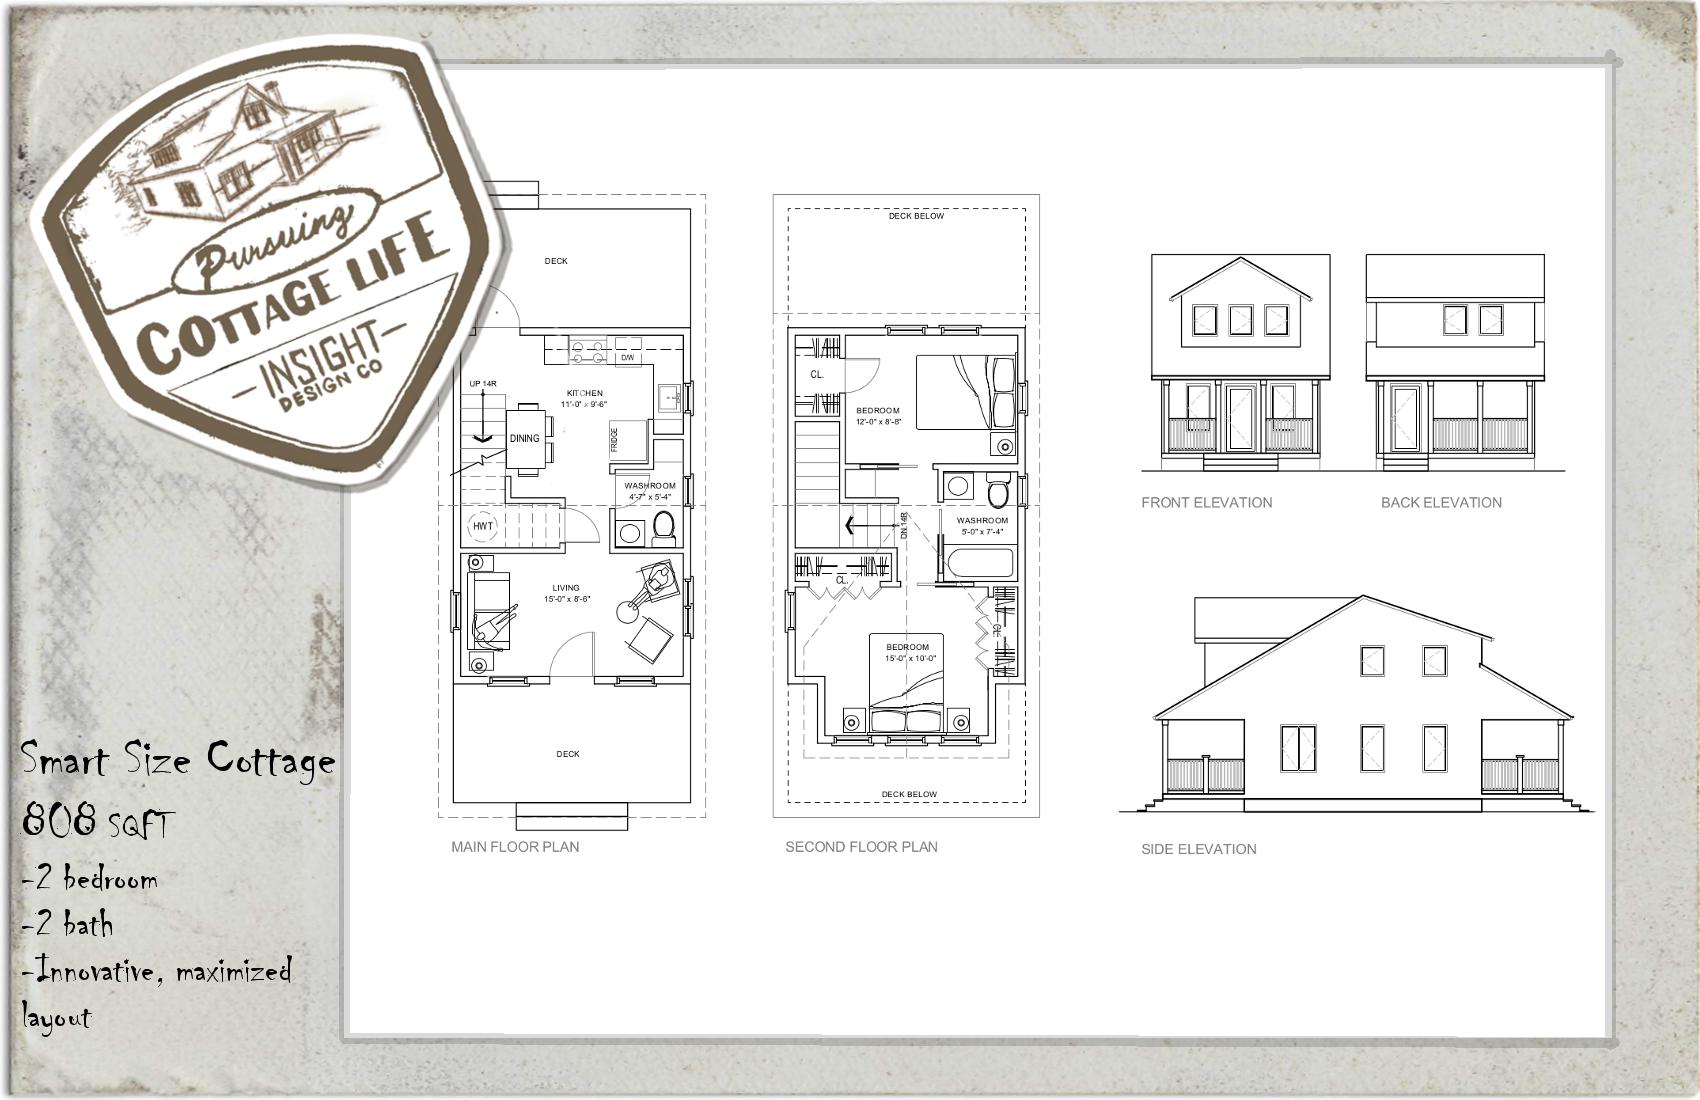 smart size cottage.png